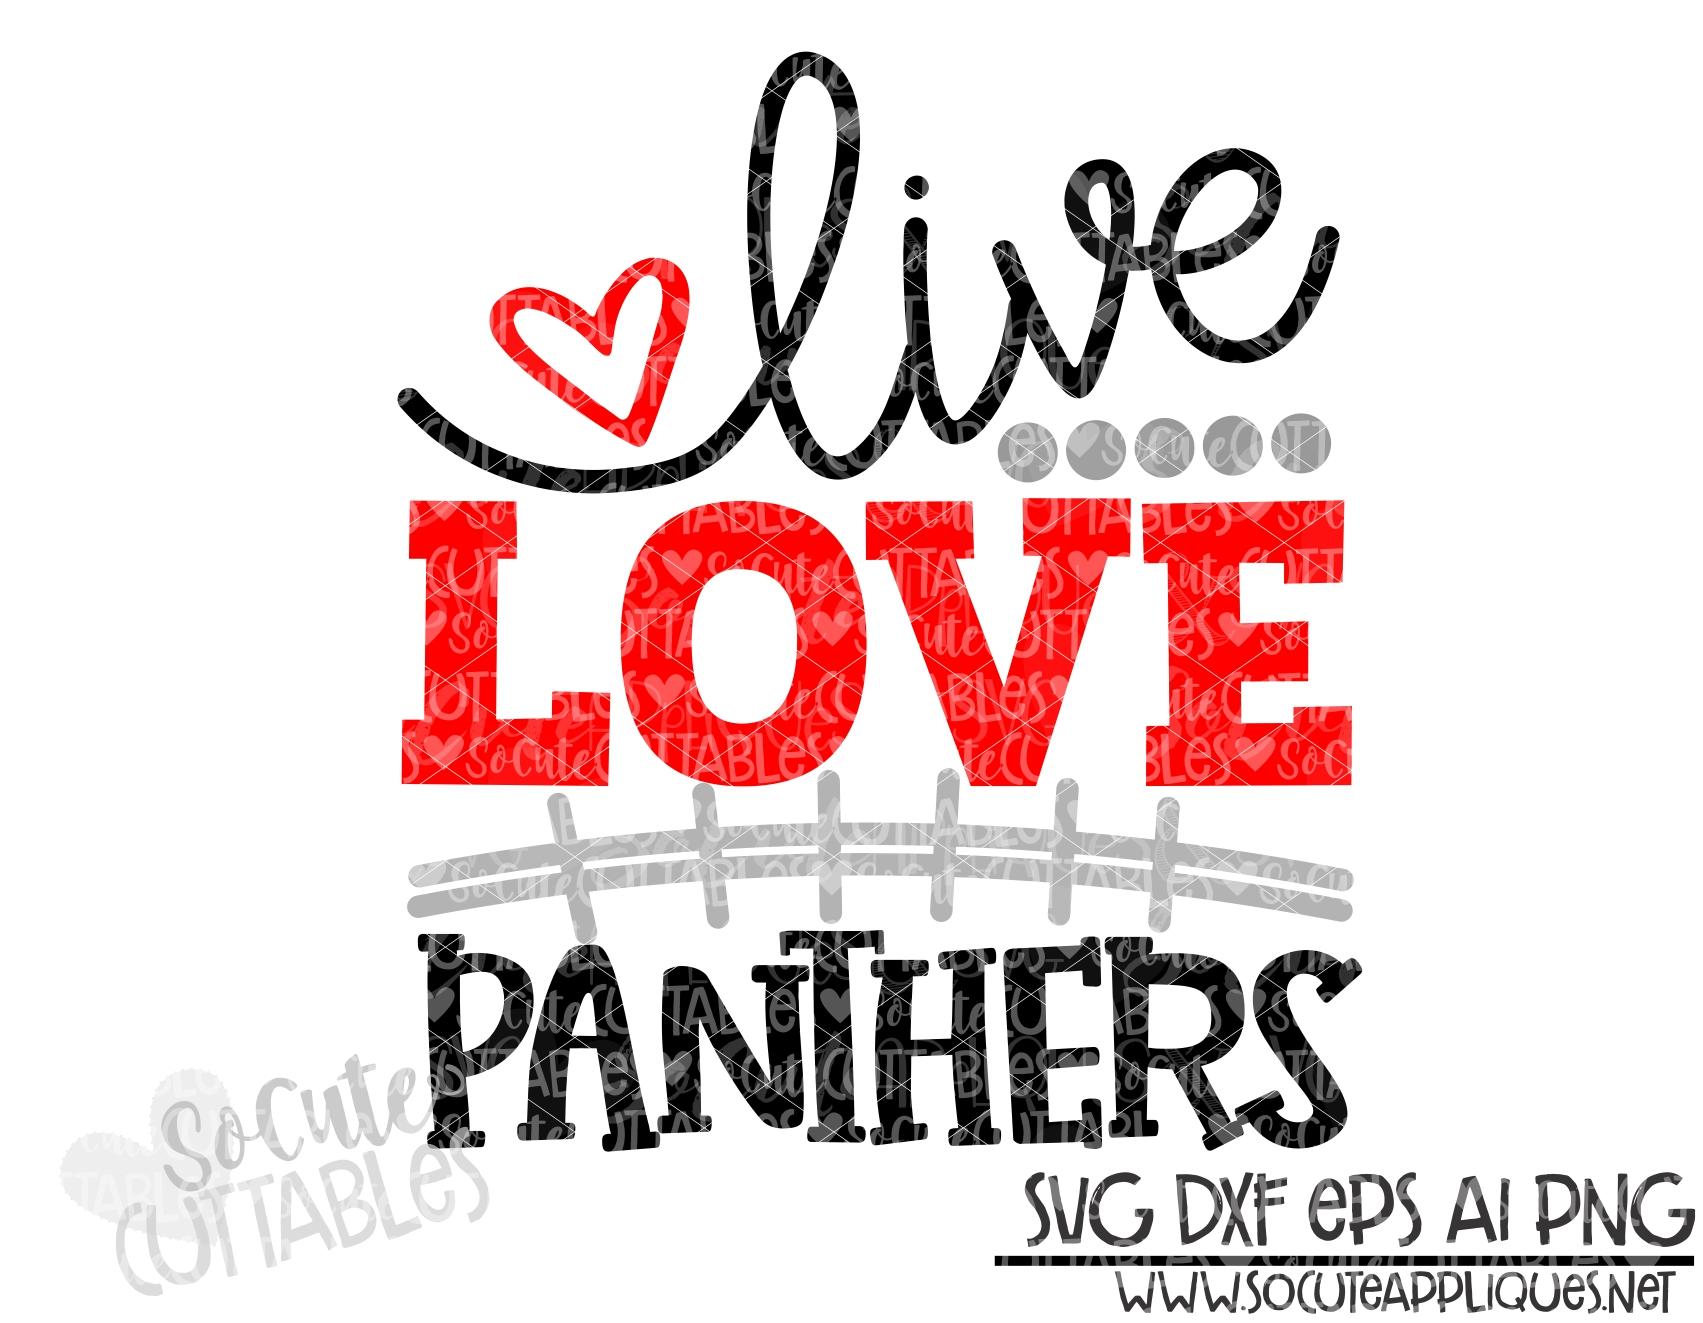 Download Live love Panthers football svg scc 19 - socuteappliques.net